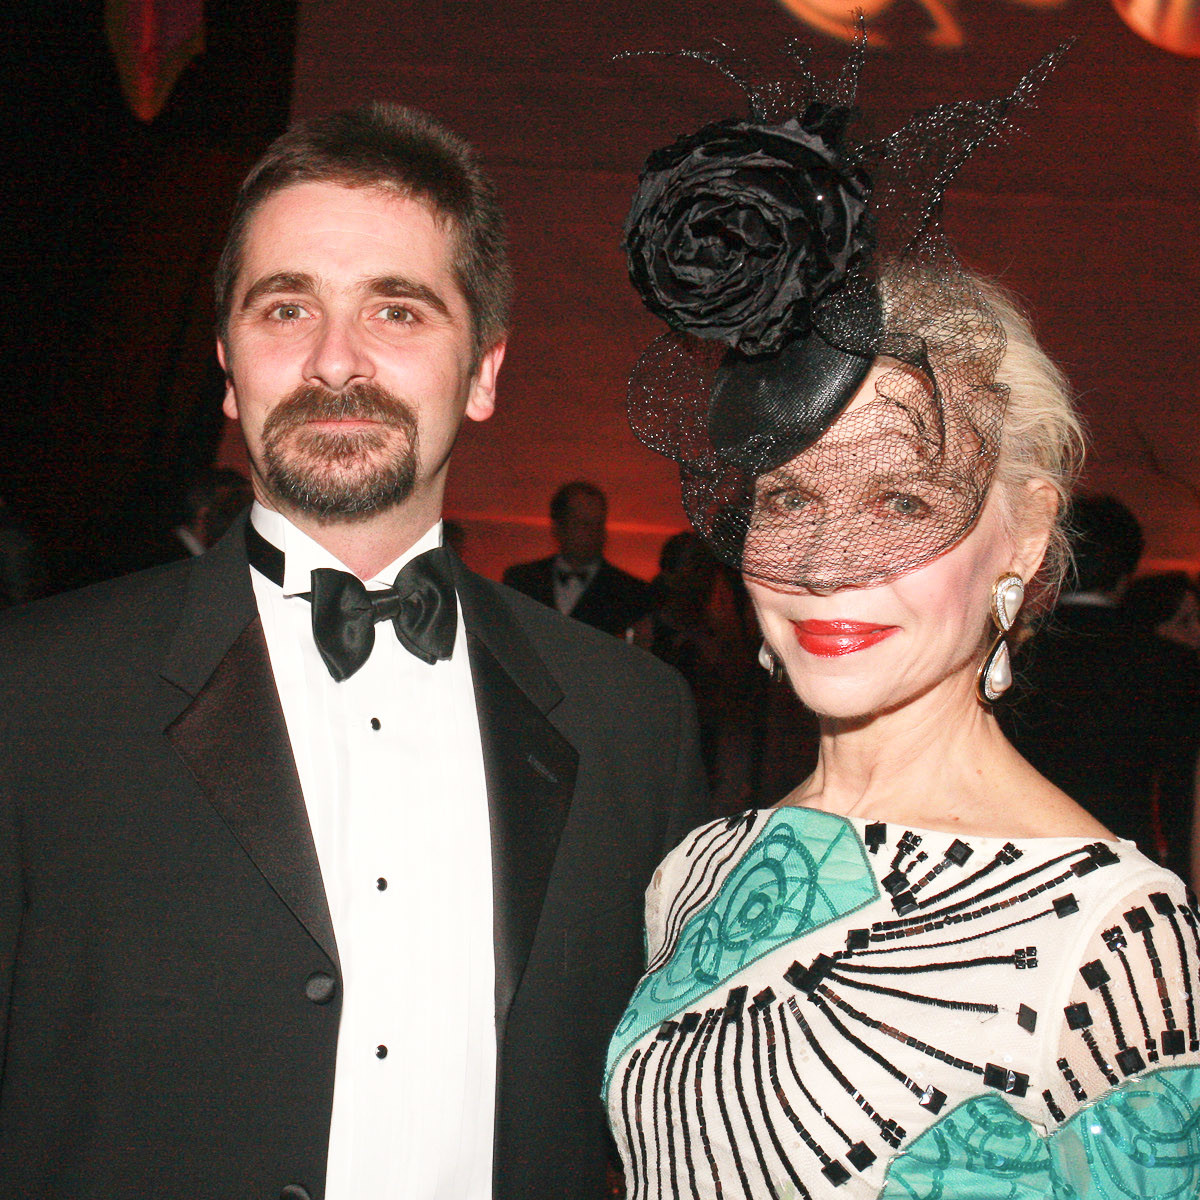 News_Ballet Ball_Feb. 2010_Stanton Welch_Lynn Wyatt_195